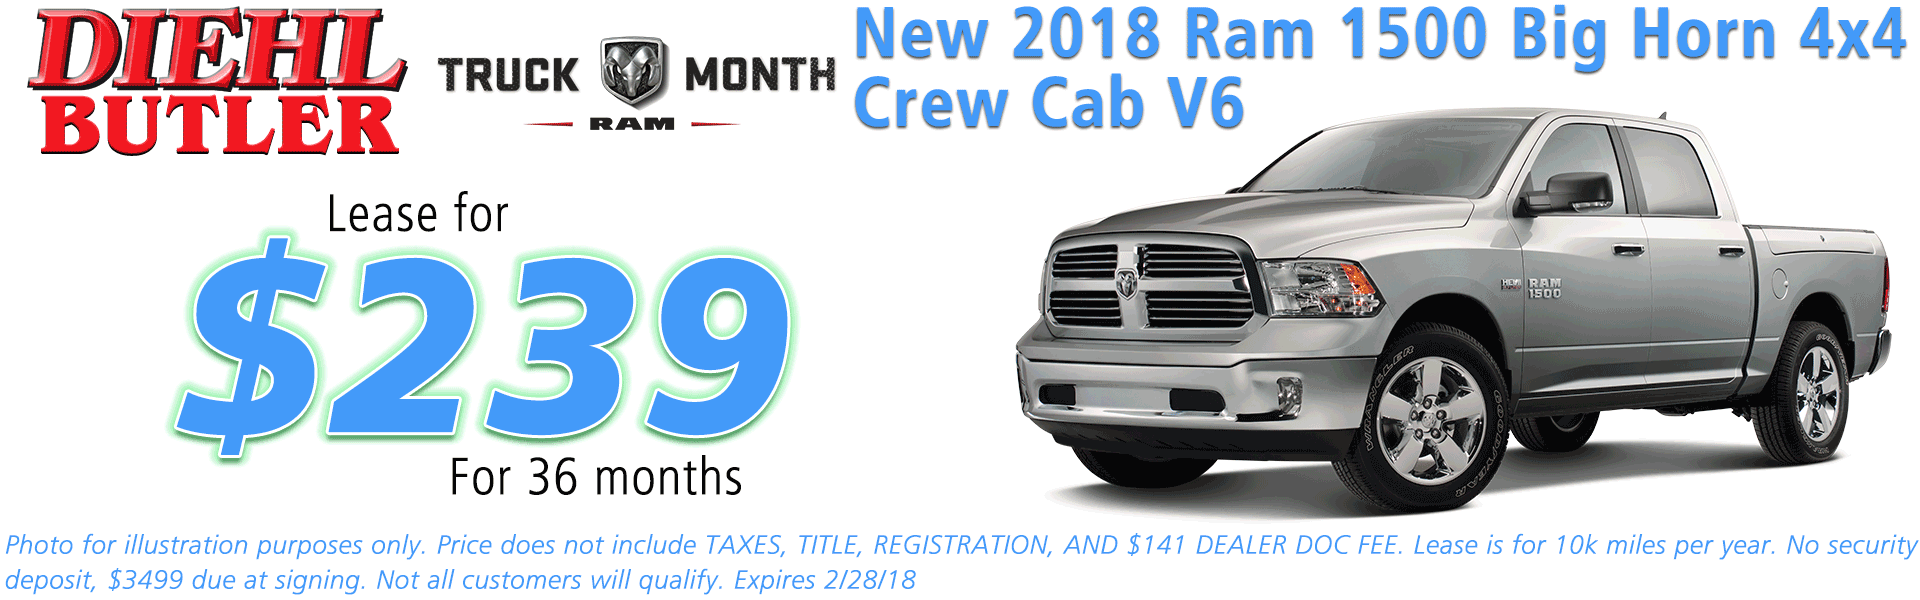 NEW 2018 RAM 1500 BIG HORN CREW CAB 4X4 5'7 BOX diehl automotive butler pa 16002 chrysler jeep dodge ram